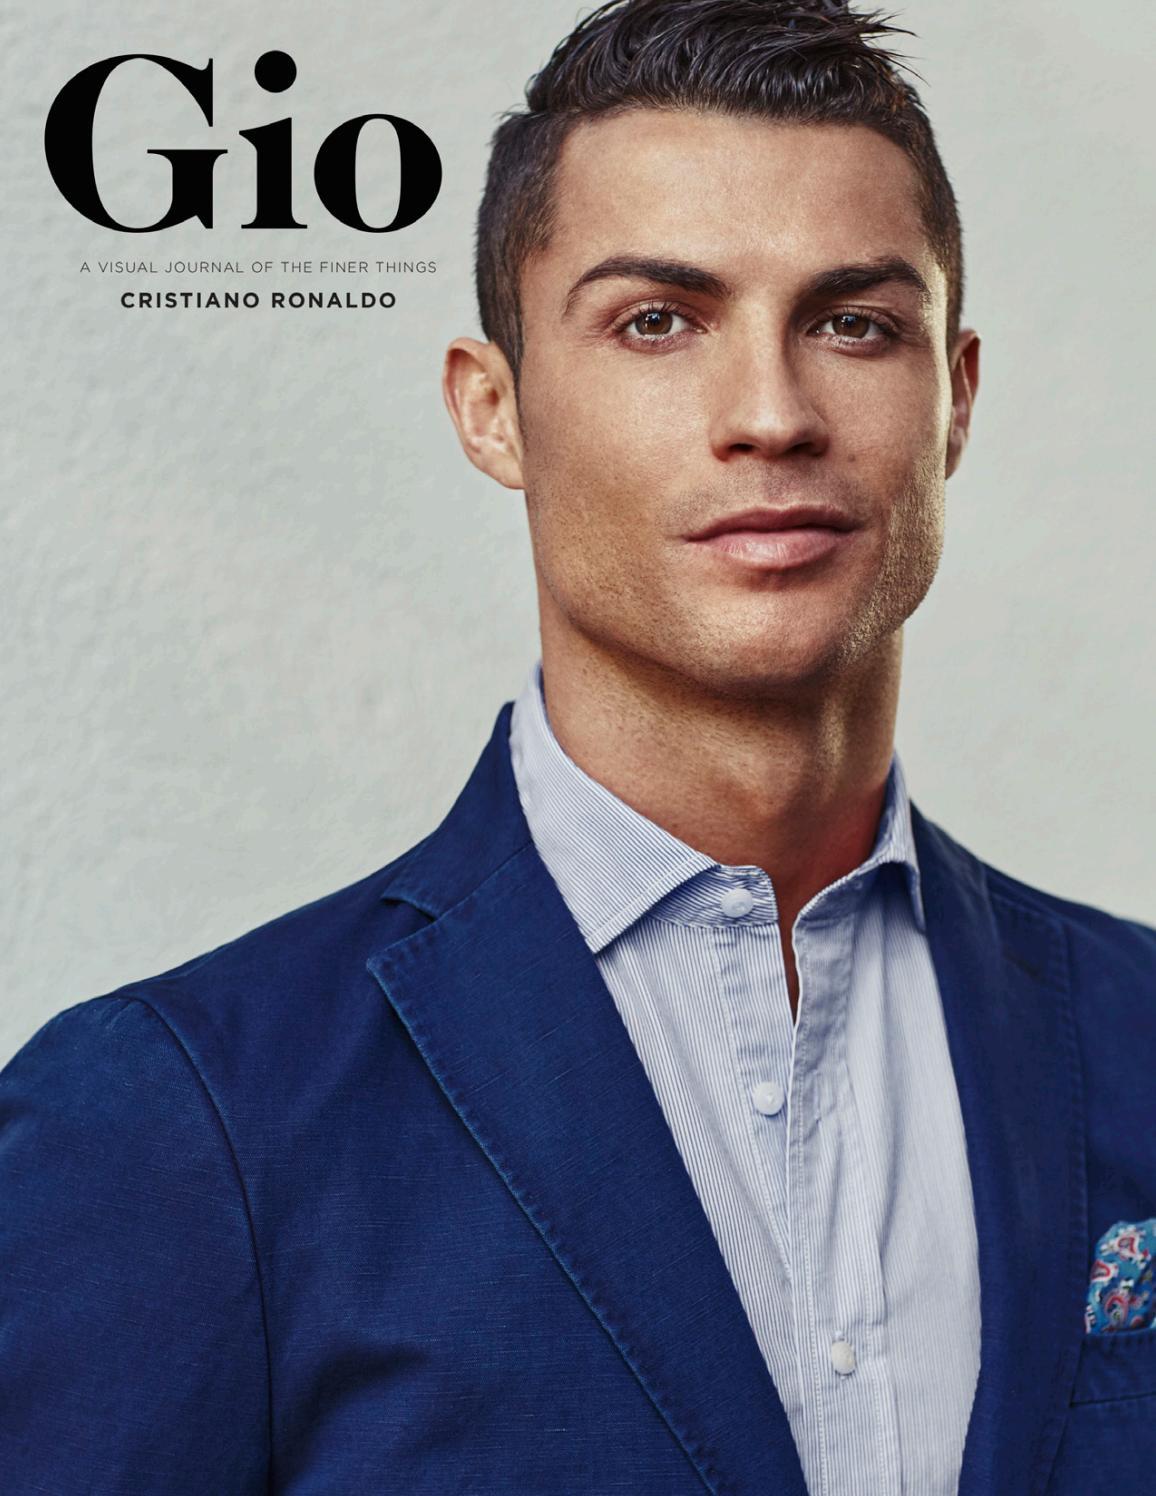 5f7a19dbf37 Gio Journal - Cristiano Ronaldo by giojournal - issuu